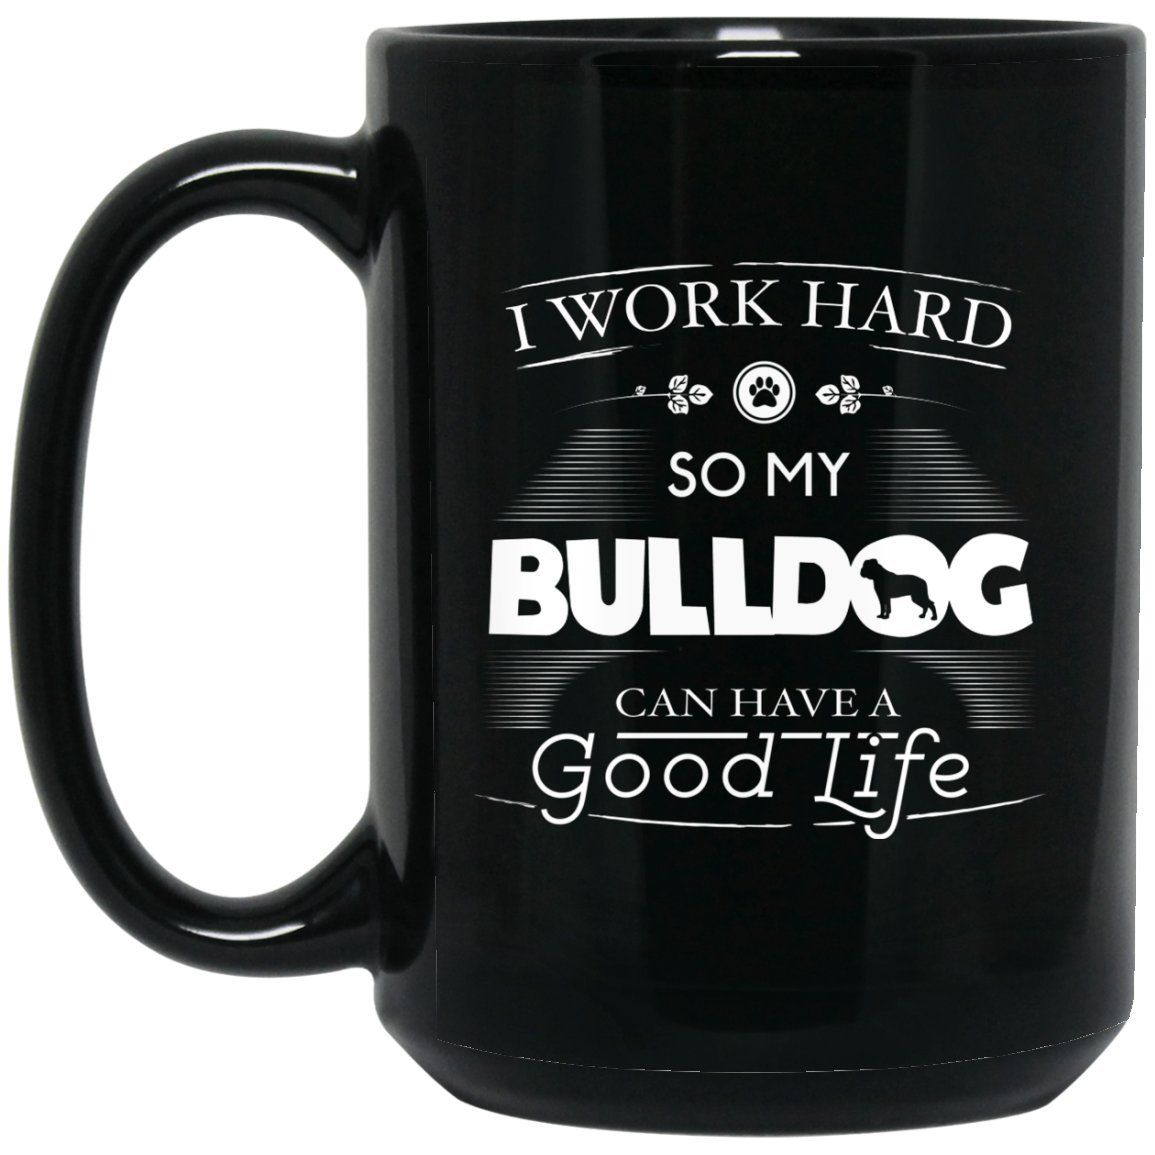 Funny Bulldog Mug - I Work Hard So My Bulldog Can Have A Good Life Chunky Font Logo Large Black Mug #funnybulldog